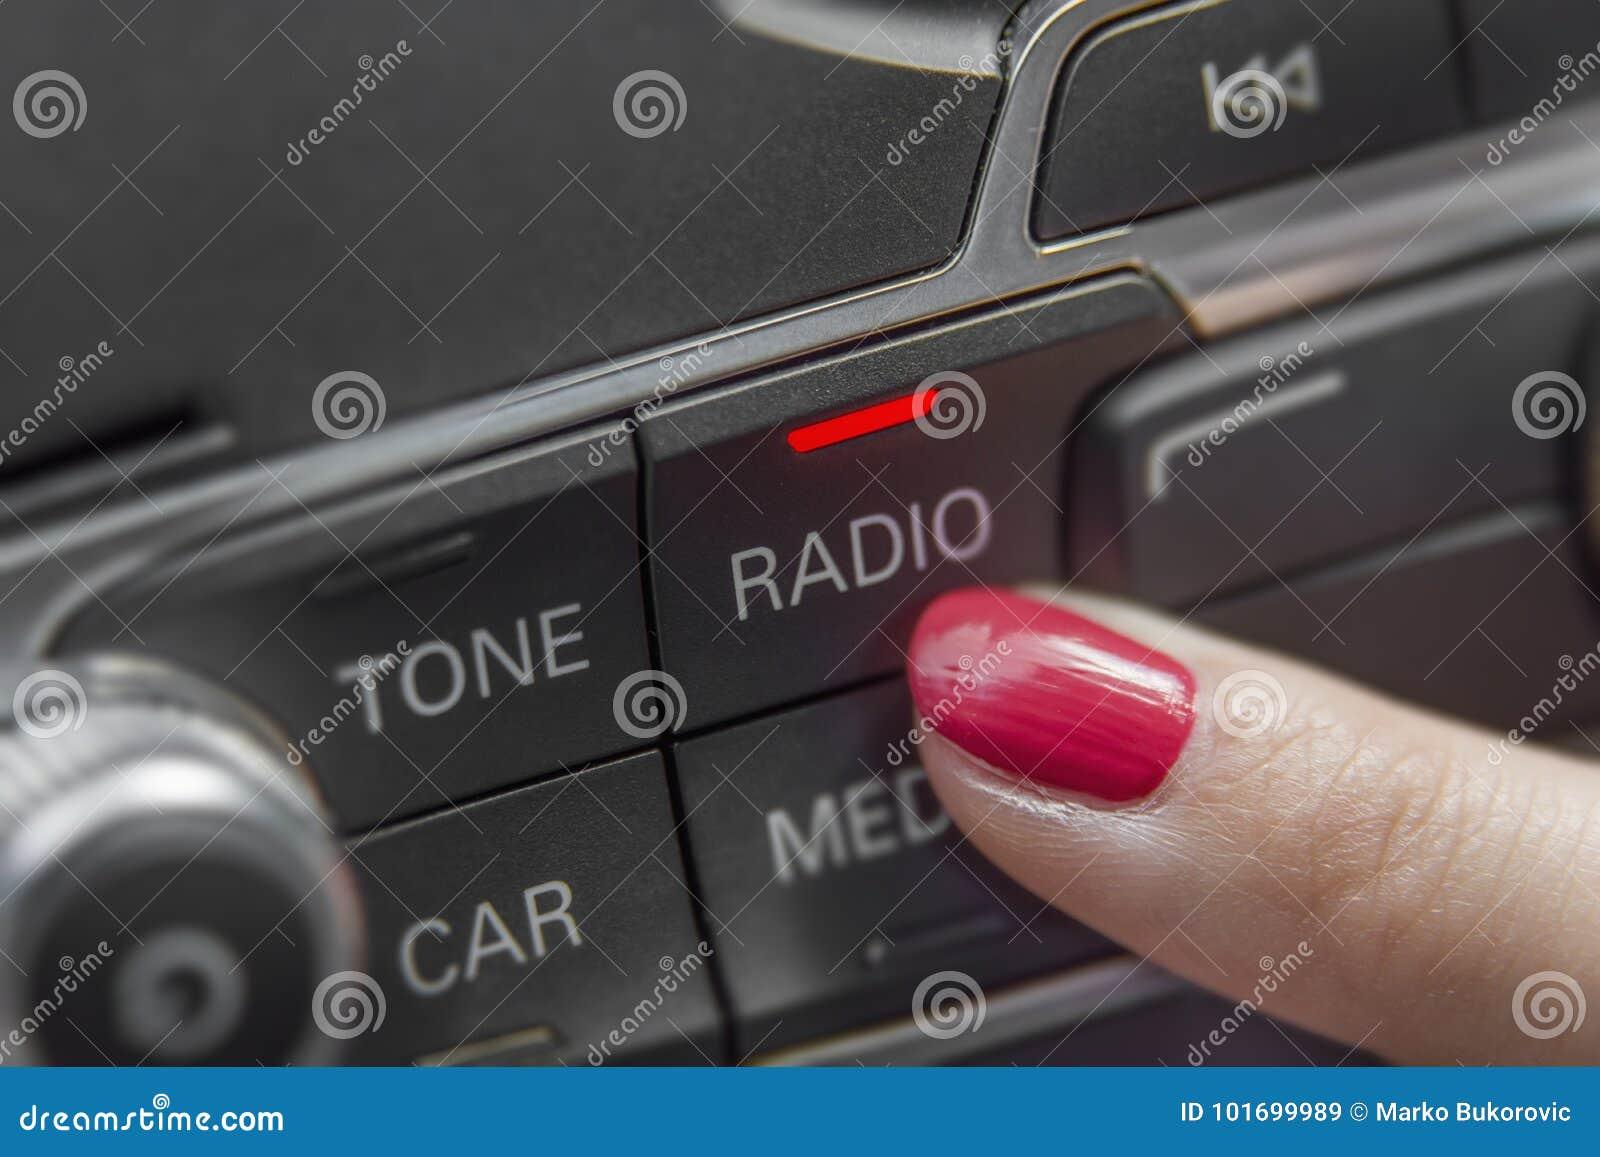 Girl pressing car radio stereo panel and modern dashboard equipment